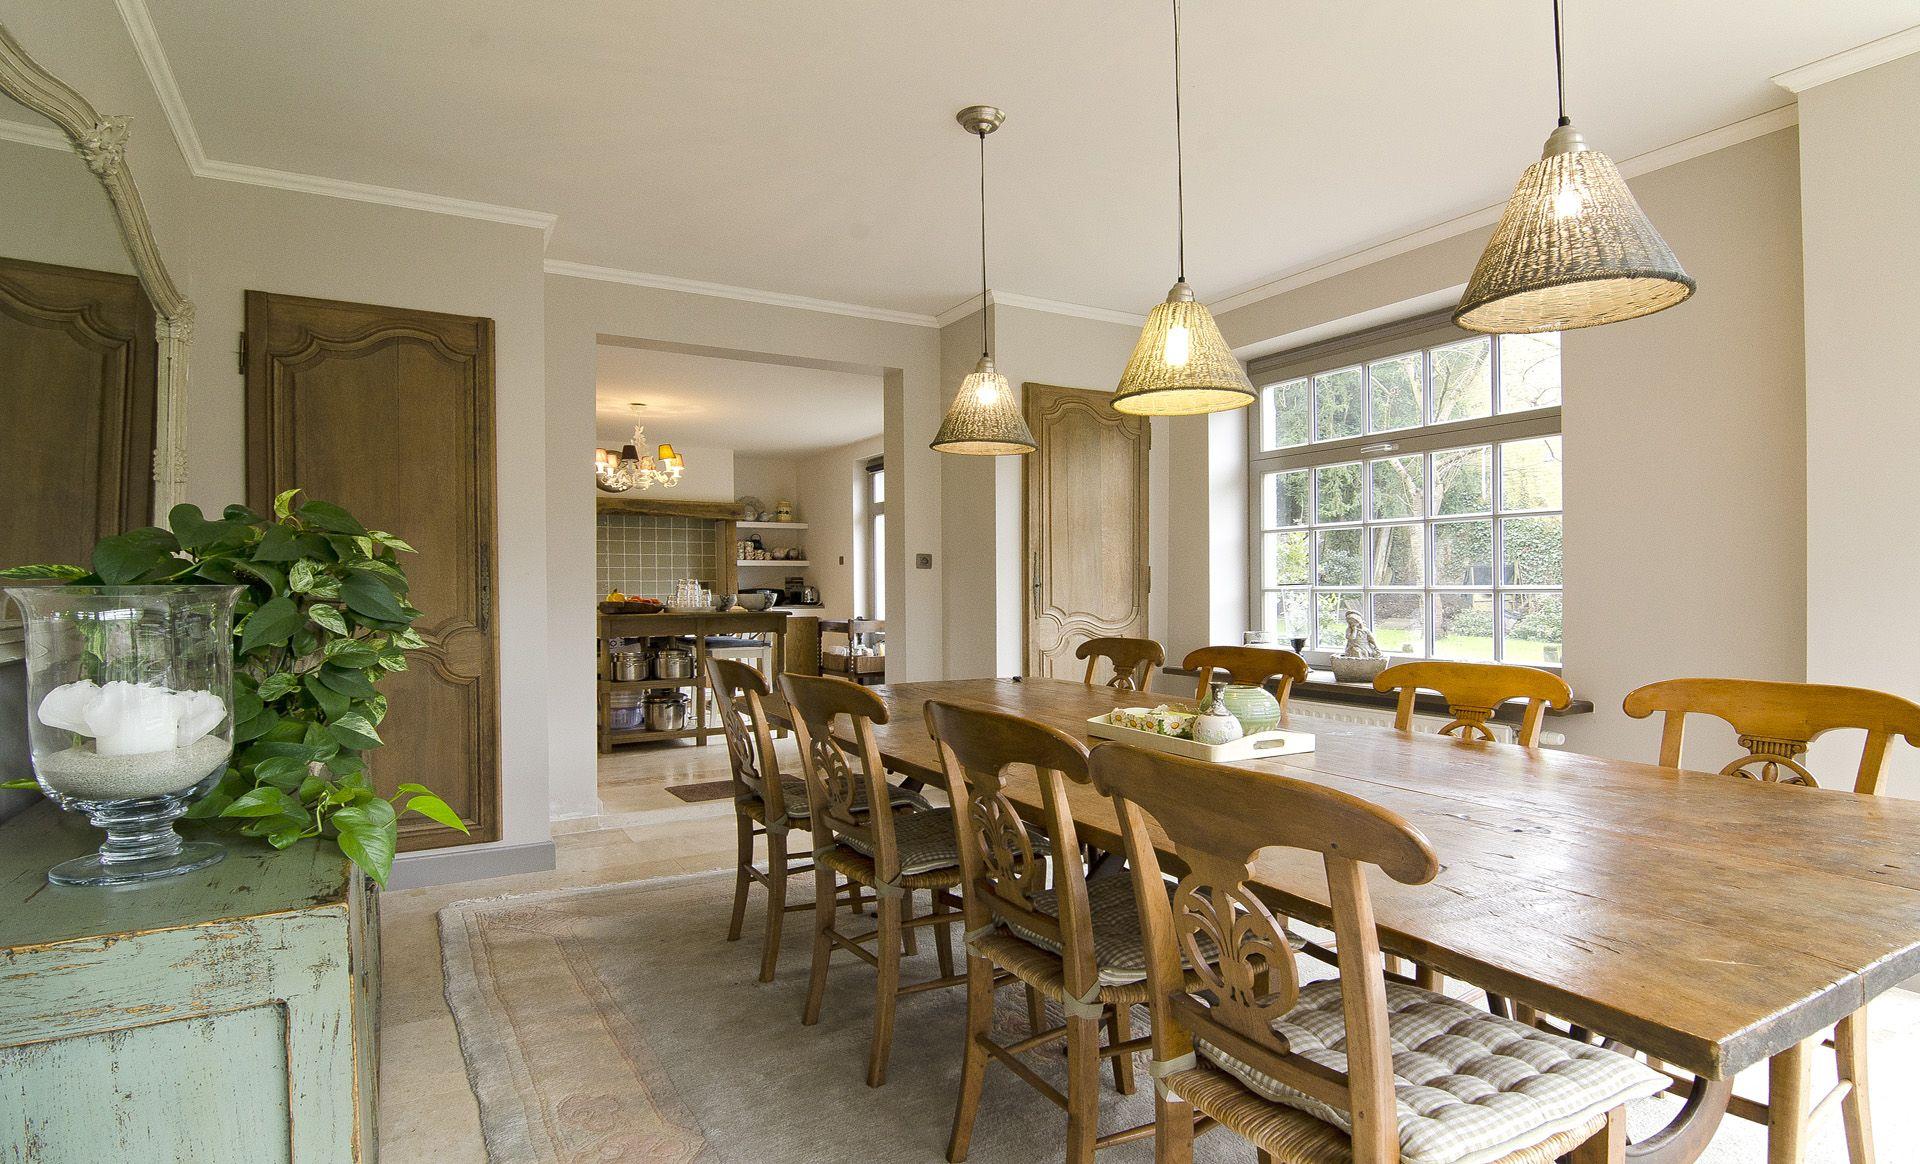 Kijkhuis architectuurfotografie keuken